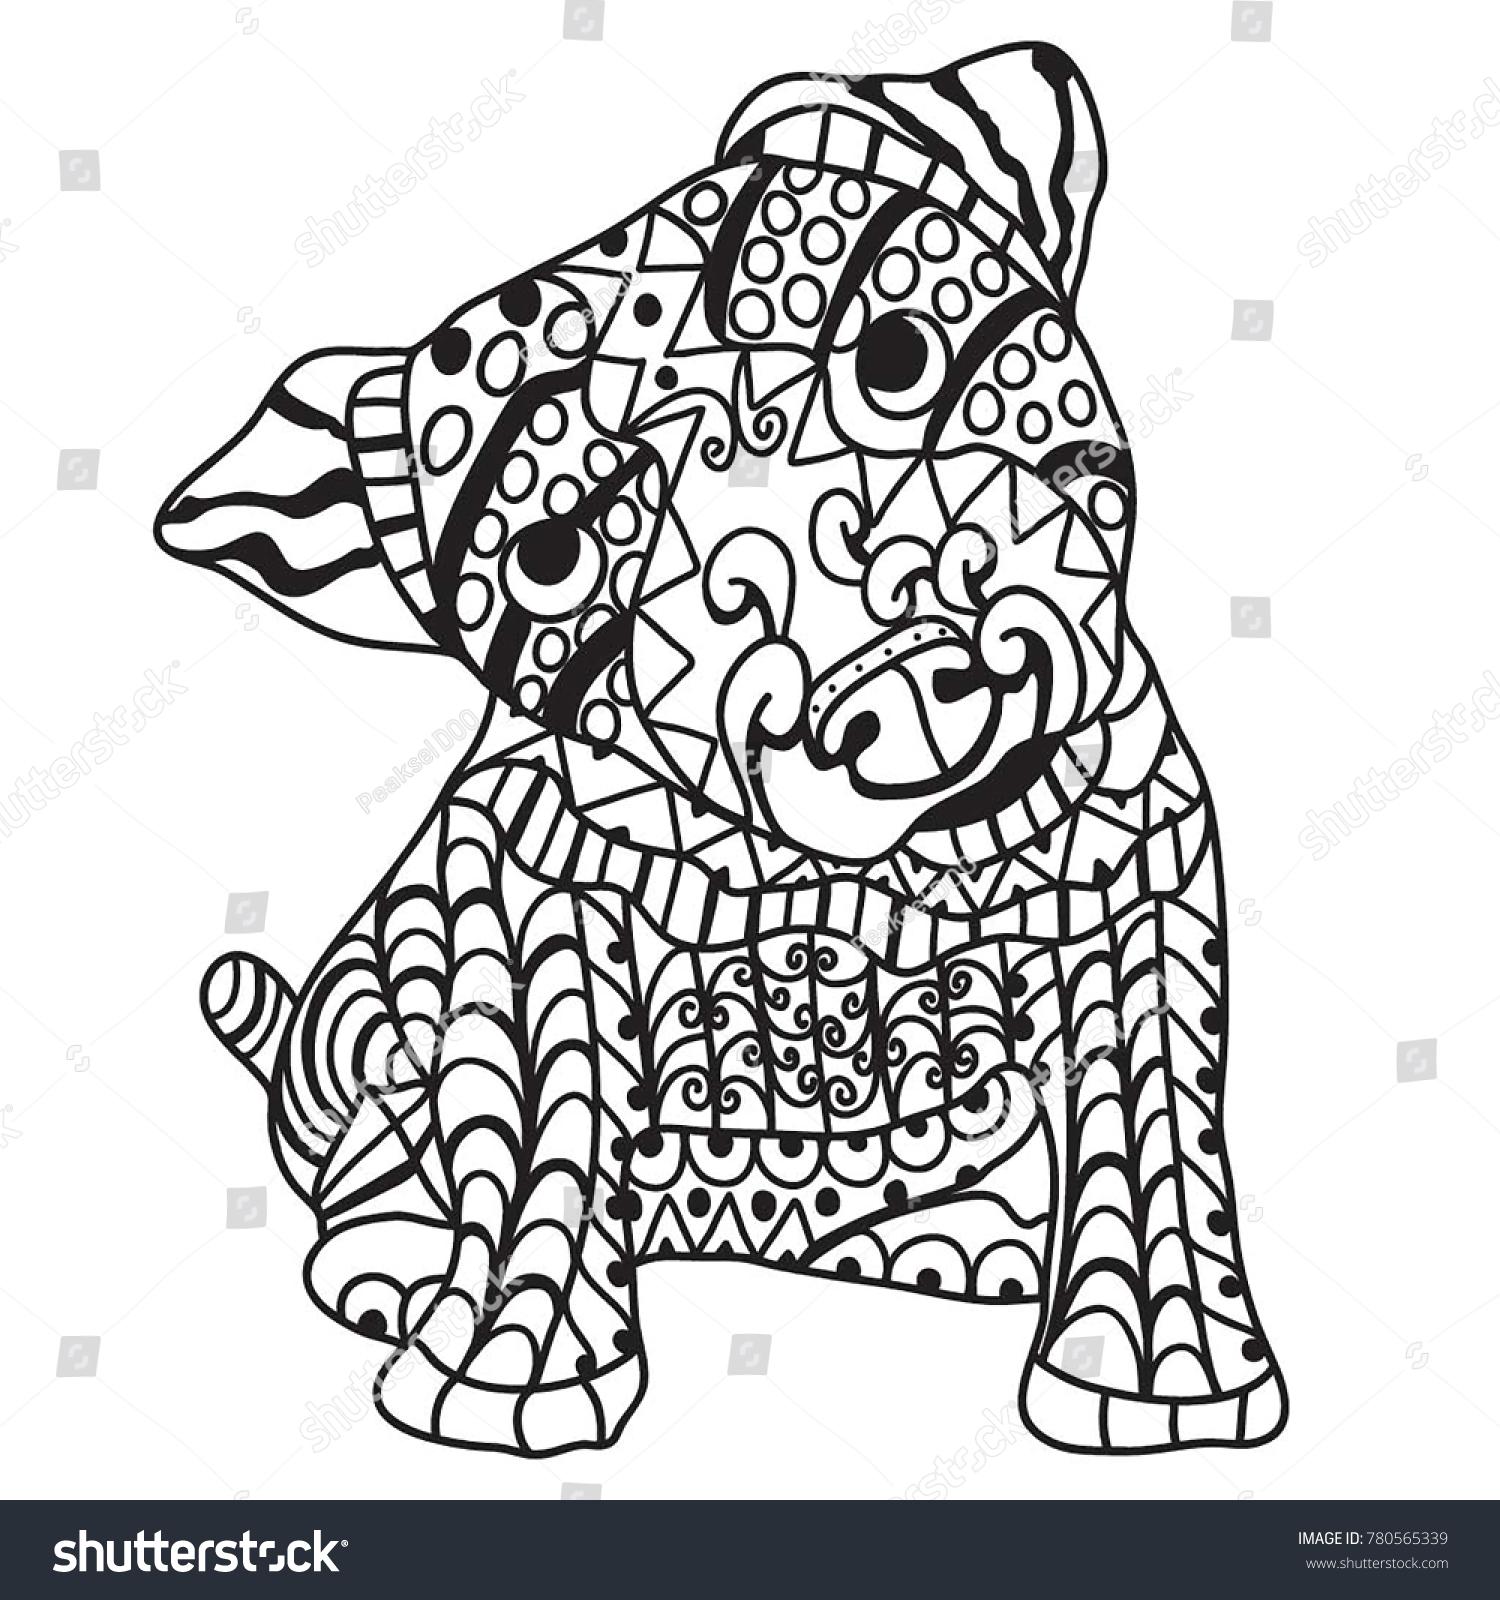 Capybara rodent animal coloring book vector illustration. Black and ...